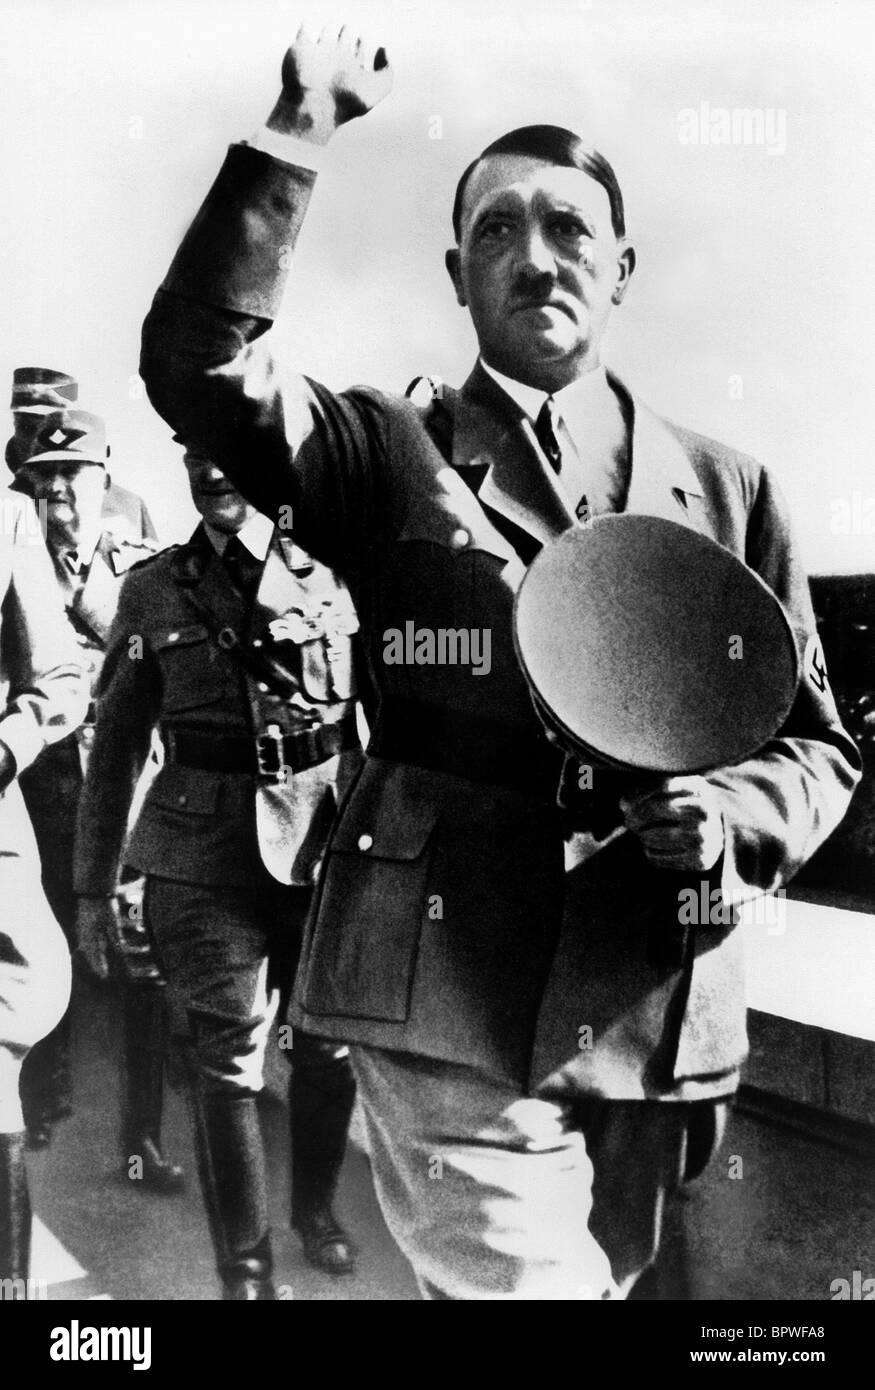 ADOLF HITLER NAZI LEADER 01 May 1940 - Stock Image